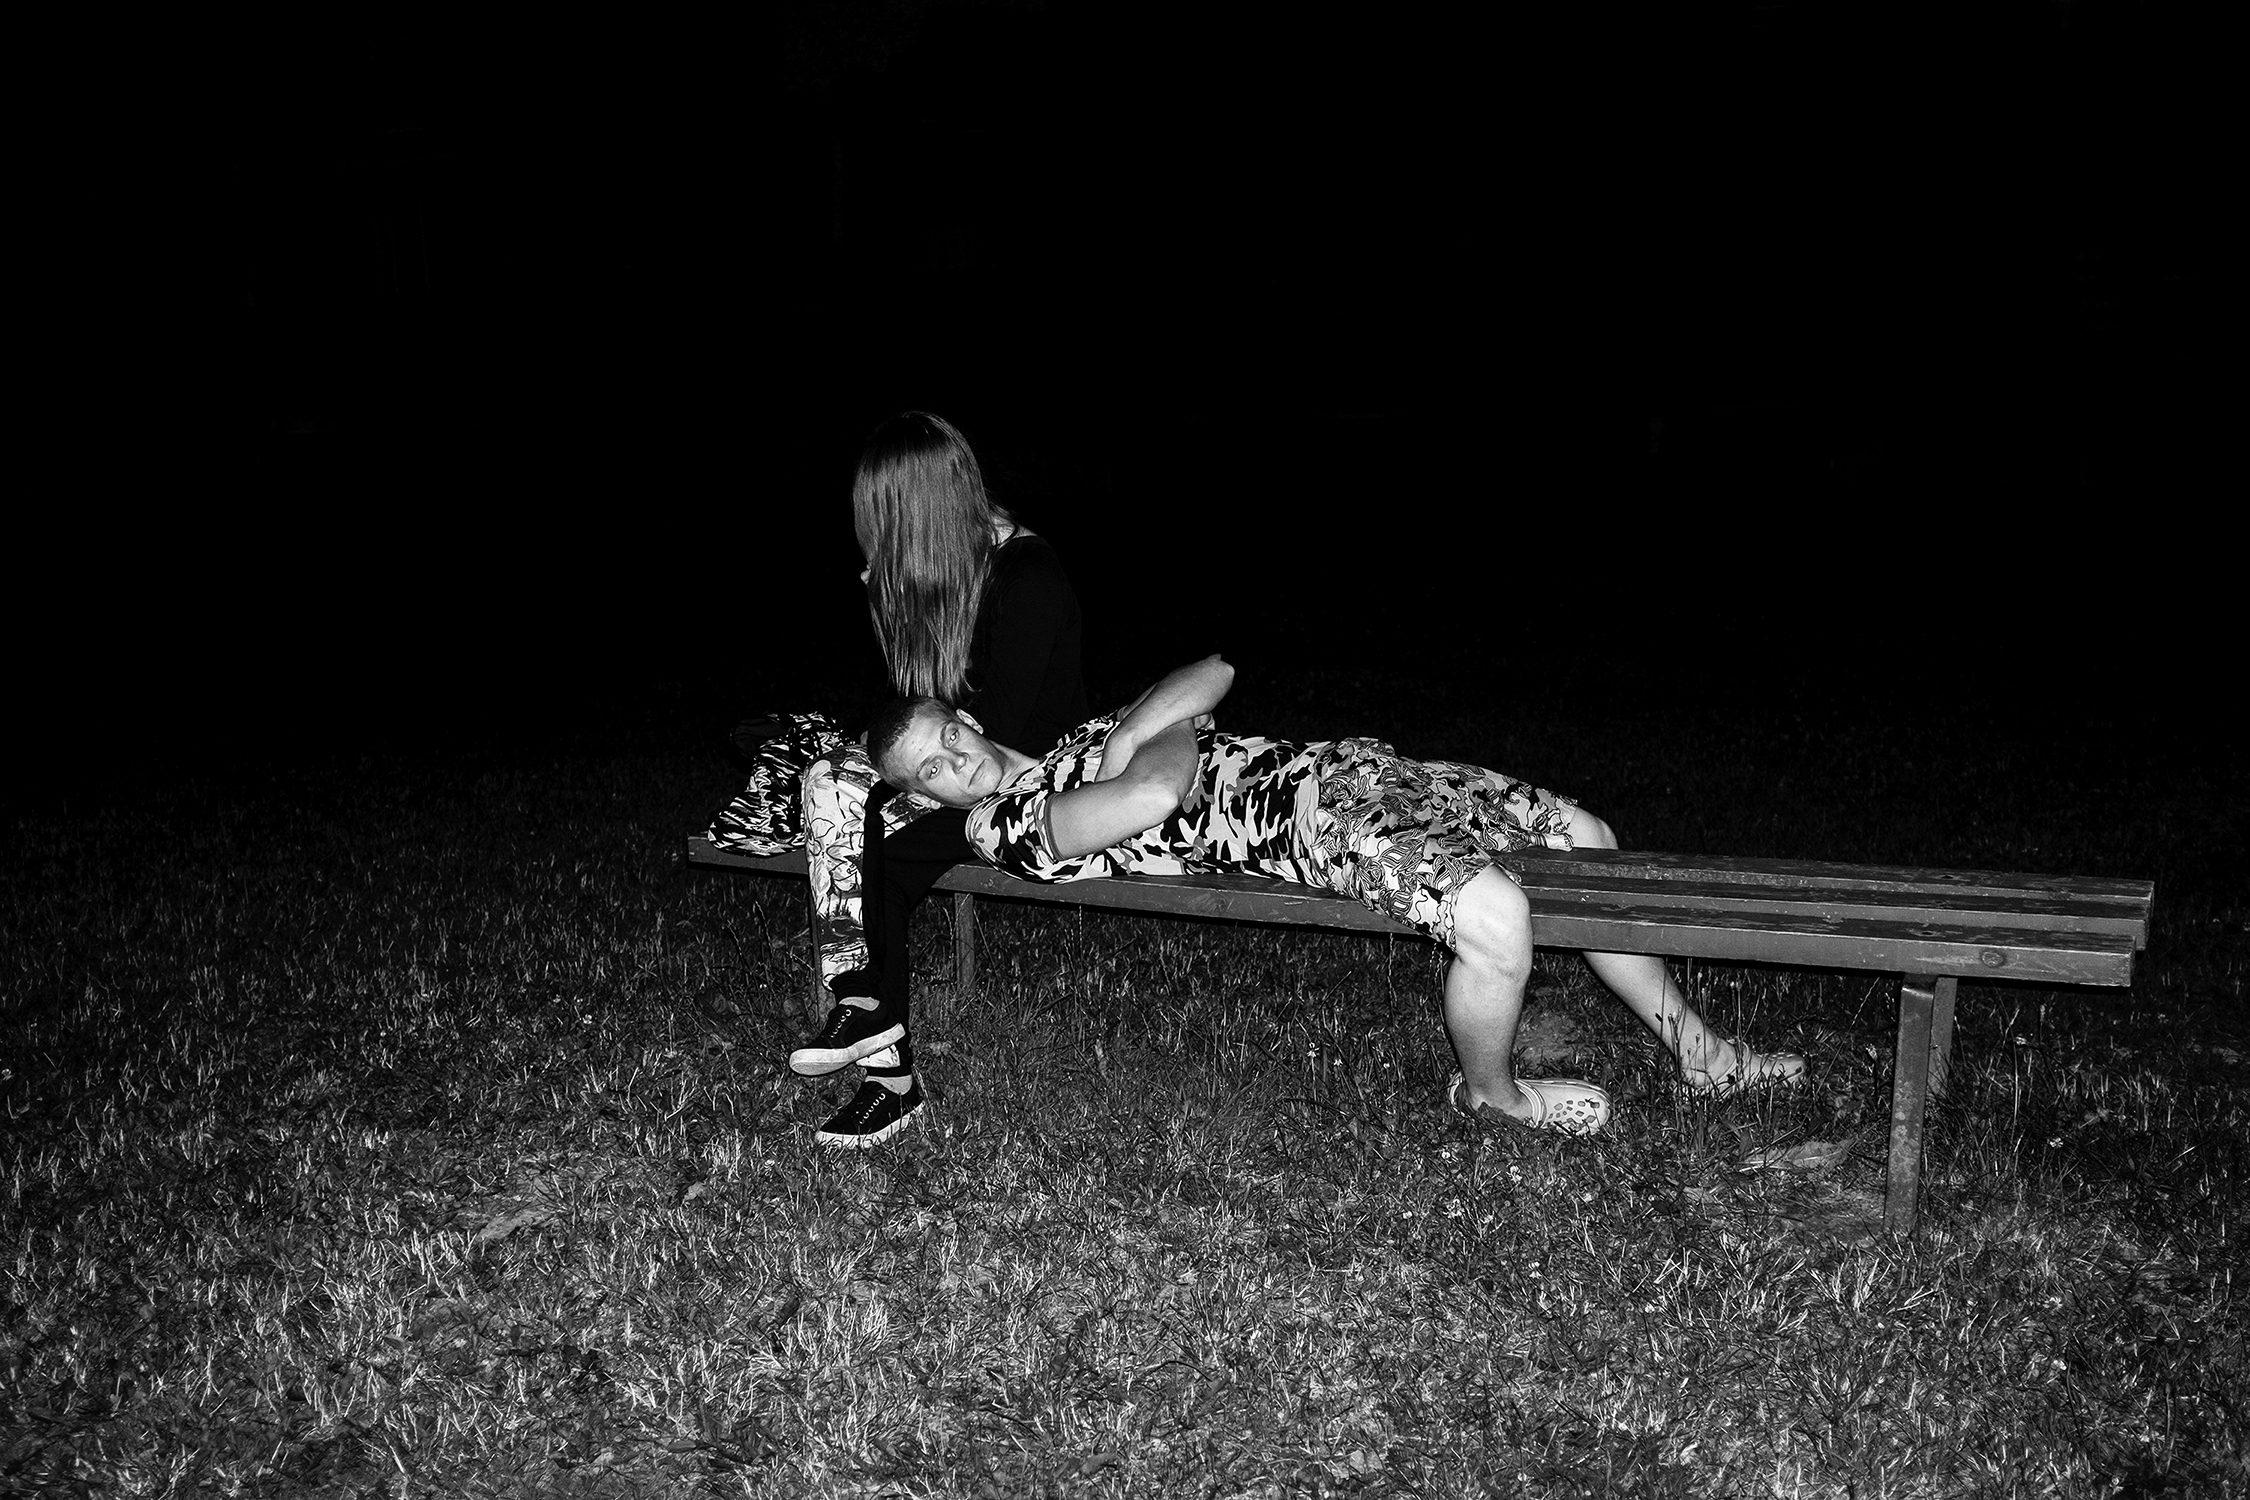 Fisheye Magazine | Les fantômes de l'adolescence